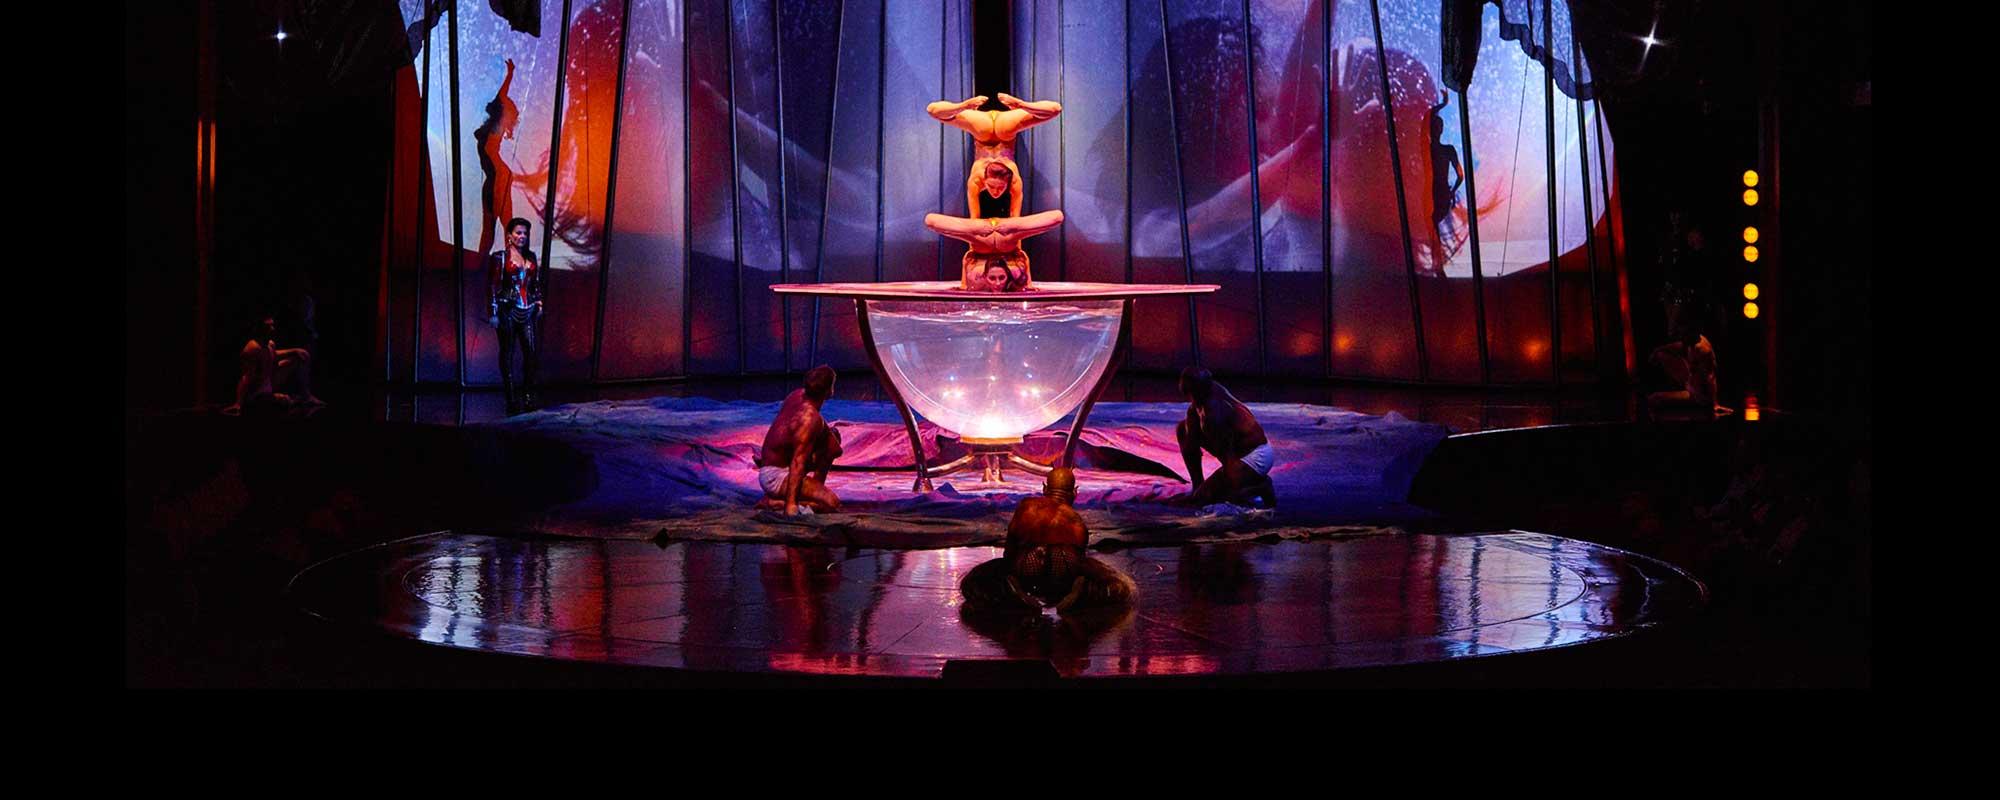 Cirque Du Soleil - Zumanity - Zumanity Theater, Las Vegas